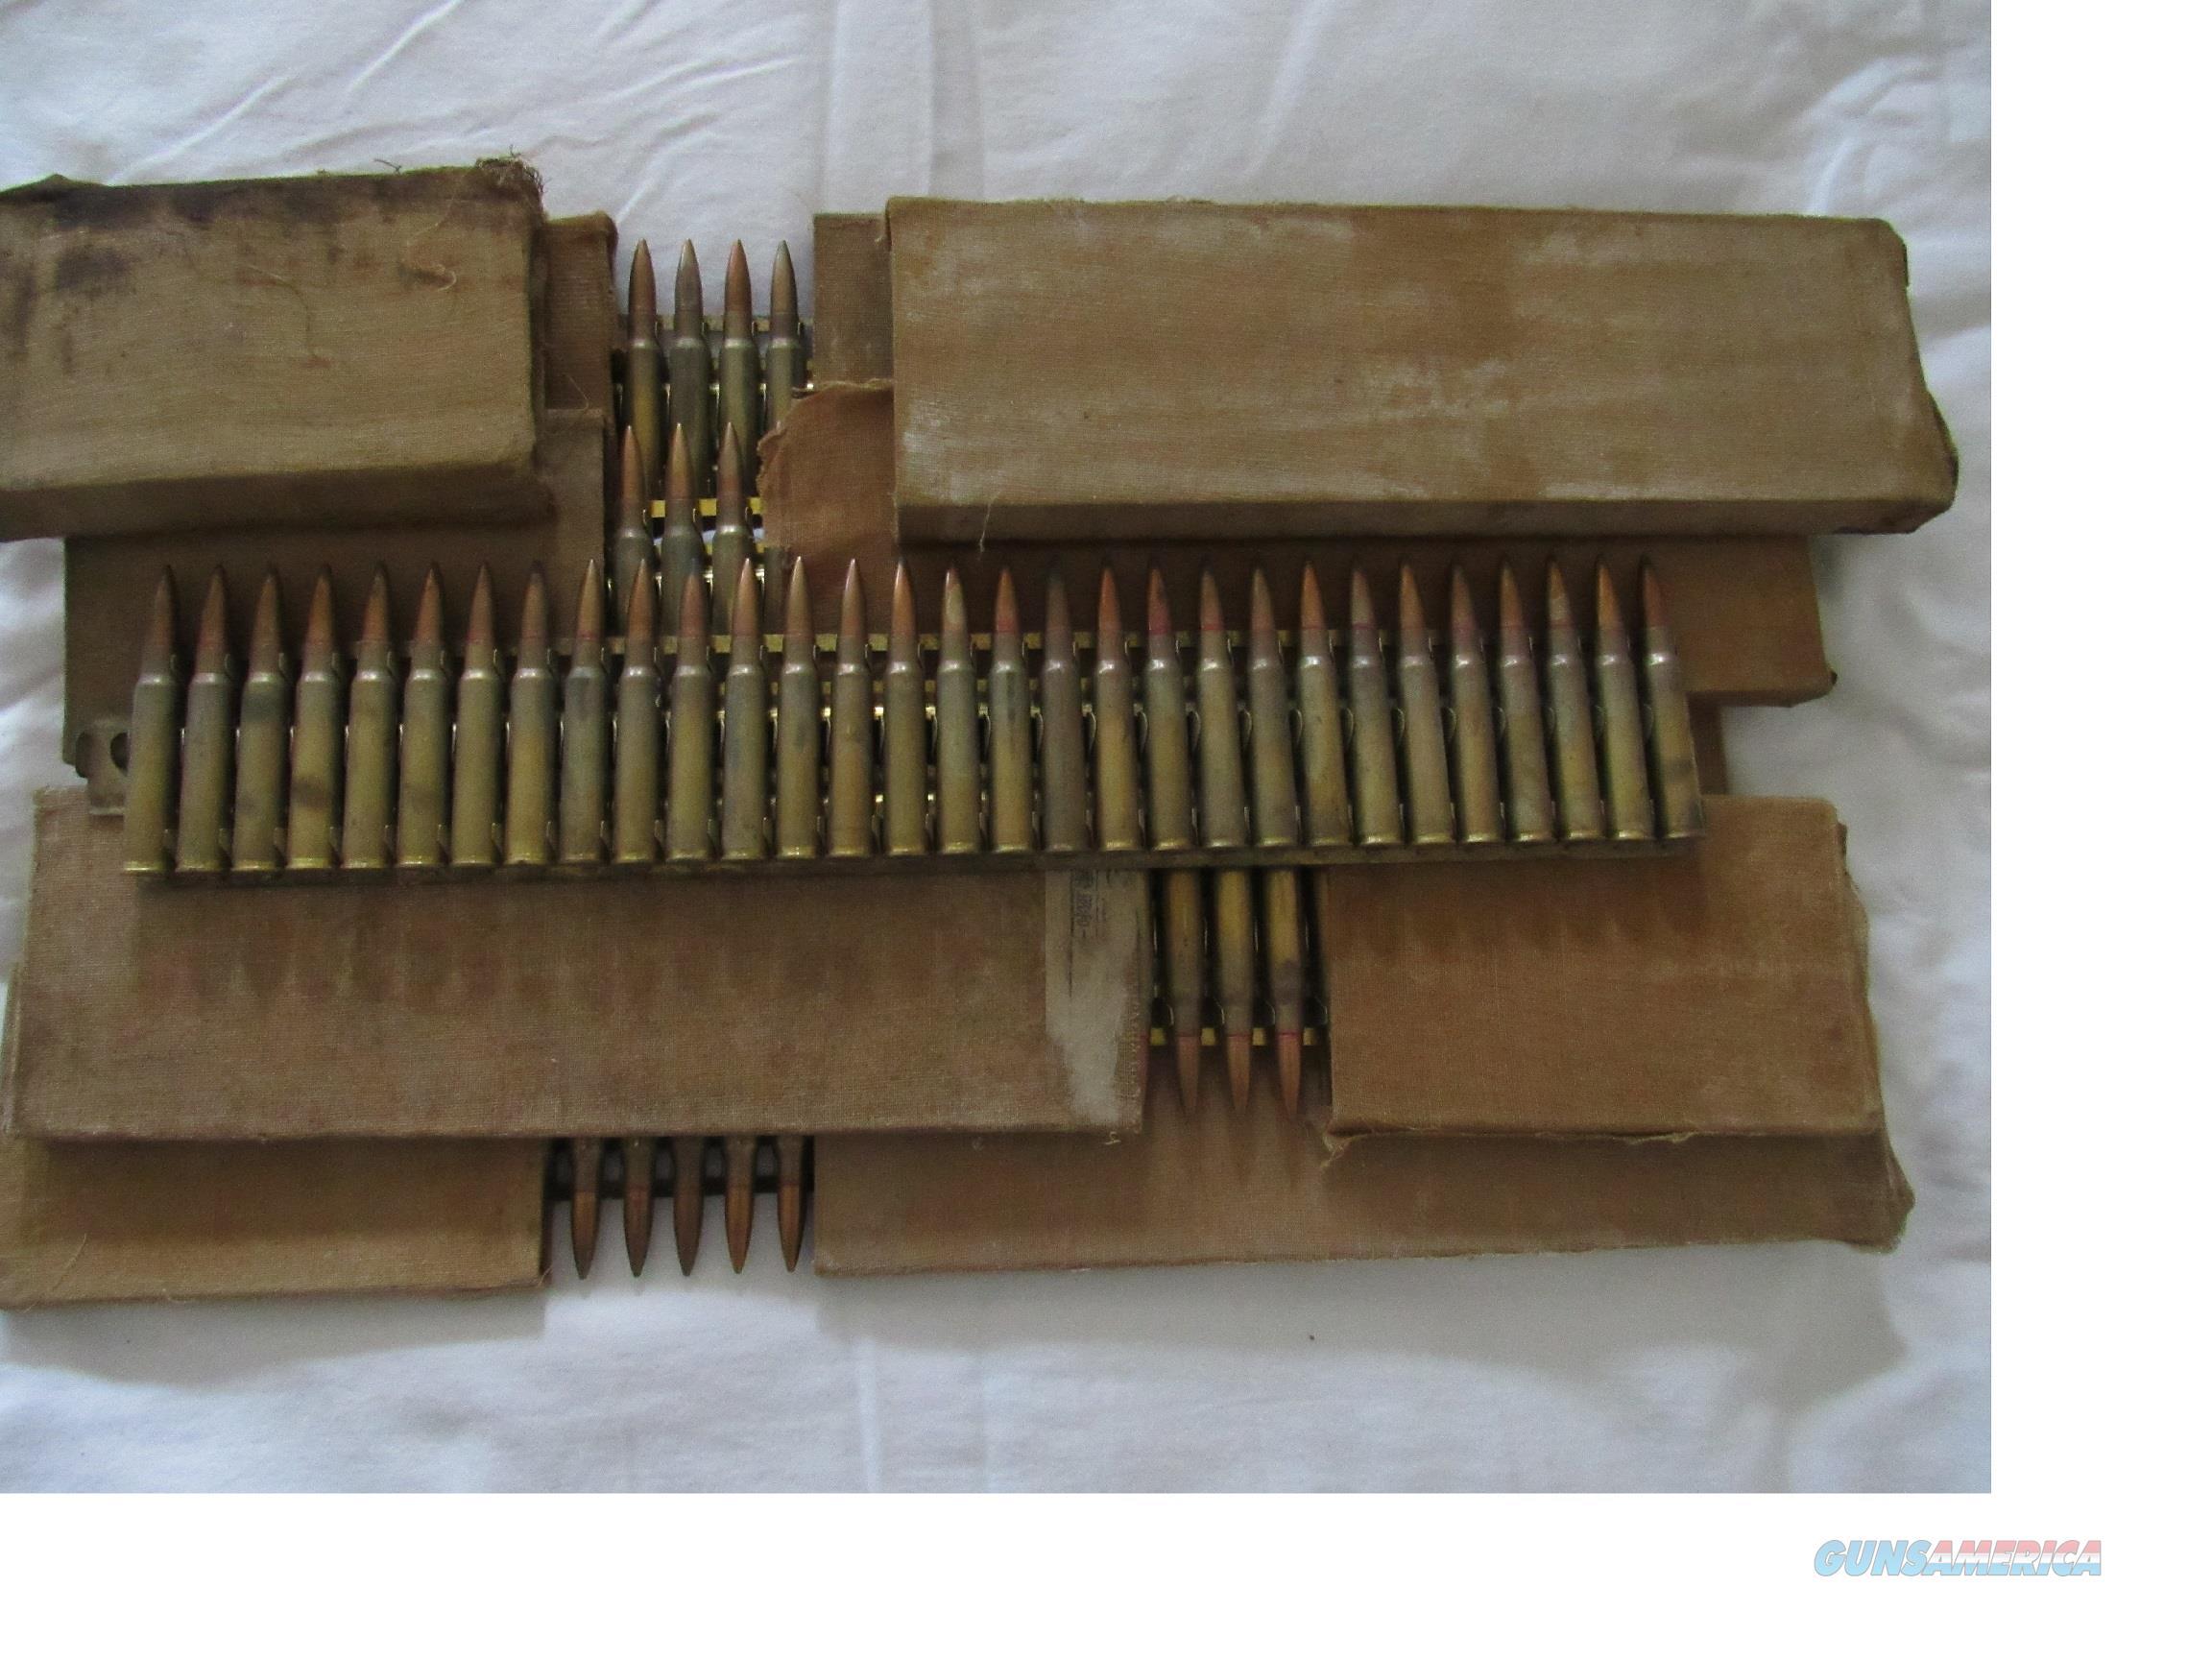 30 rds WWII Japanese 7.7 x 58 machine Gun Ammo in Boxes  Non-Guns > Ammunition